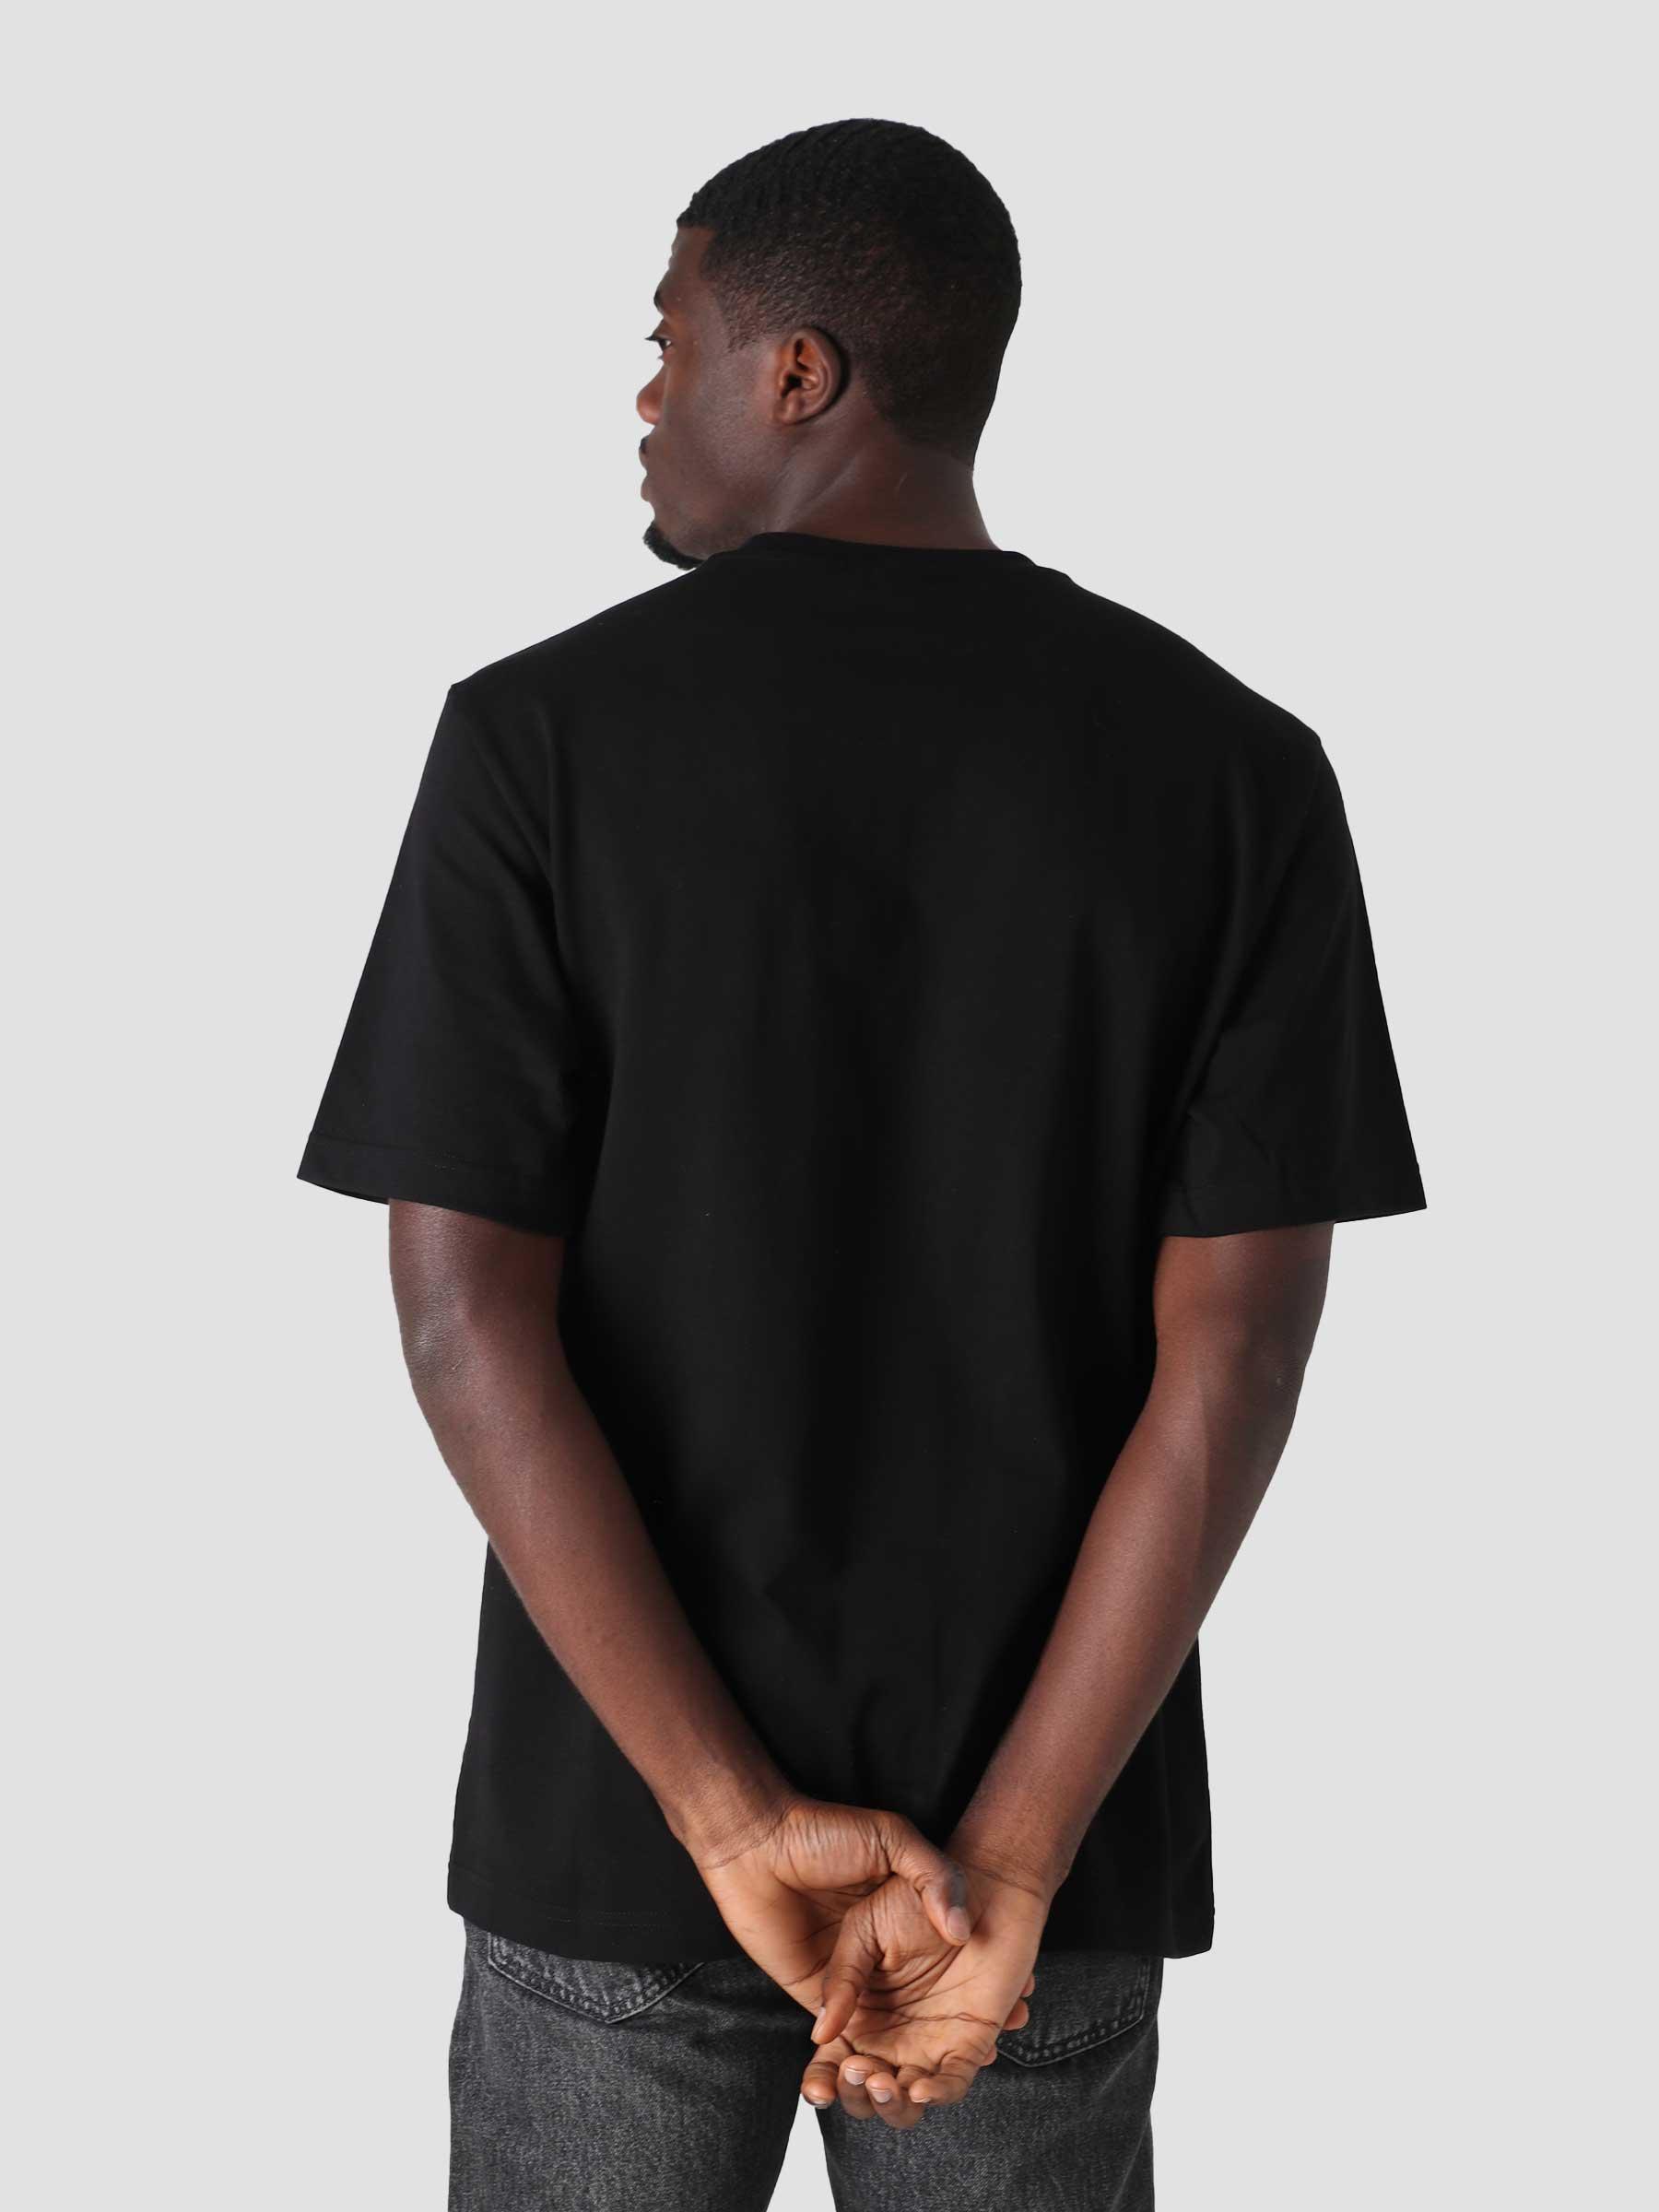 Hosort T-Shirt Black 2123031